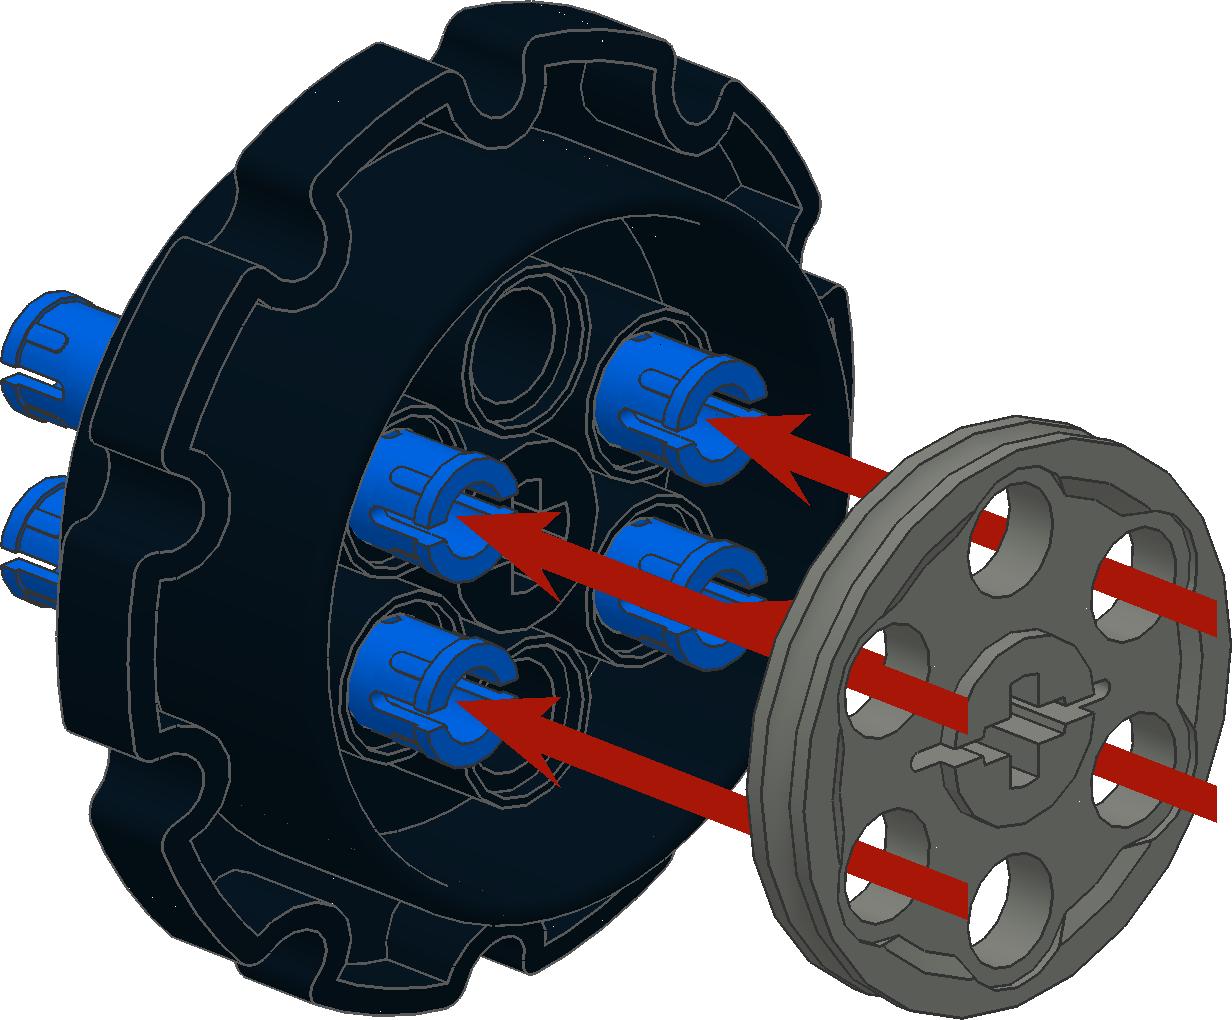 ev3wayet18_wheel_arrow_1_0_0_0_1_0_0_0_1_2_4960_600_DPI_1.png